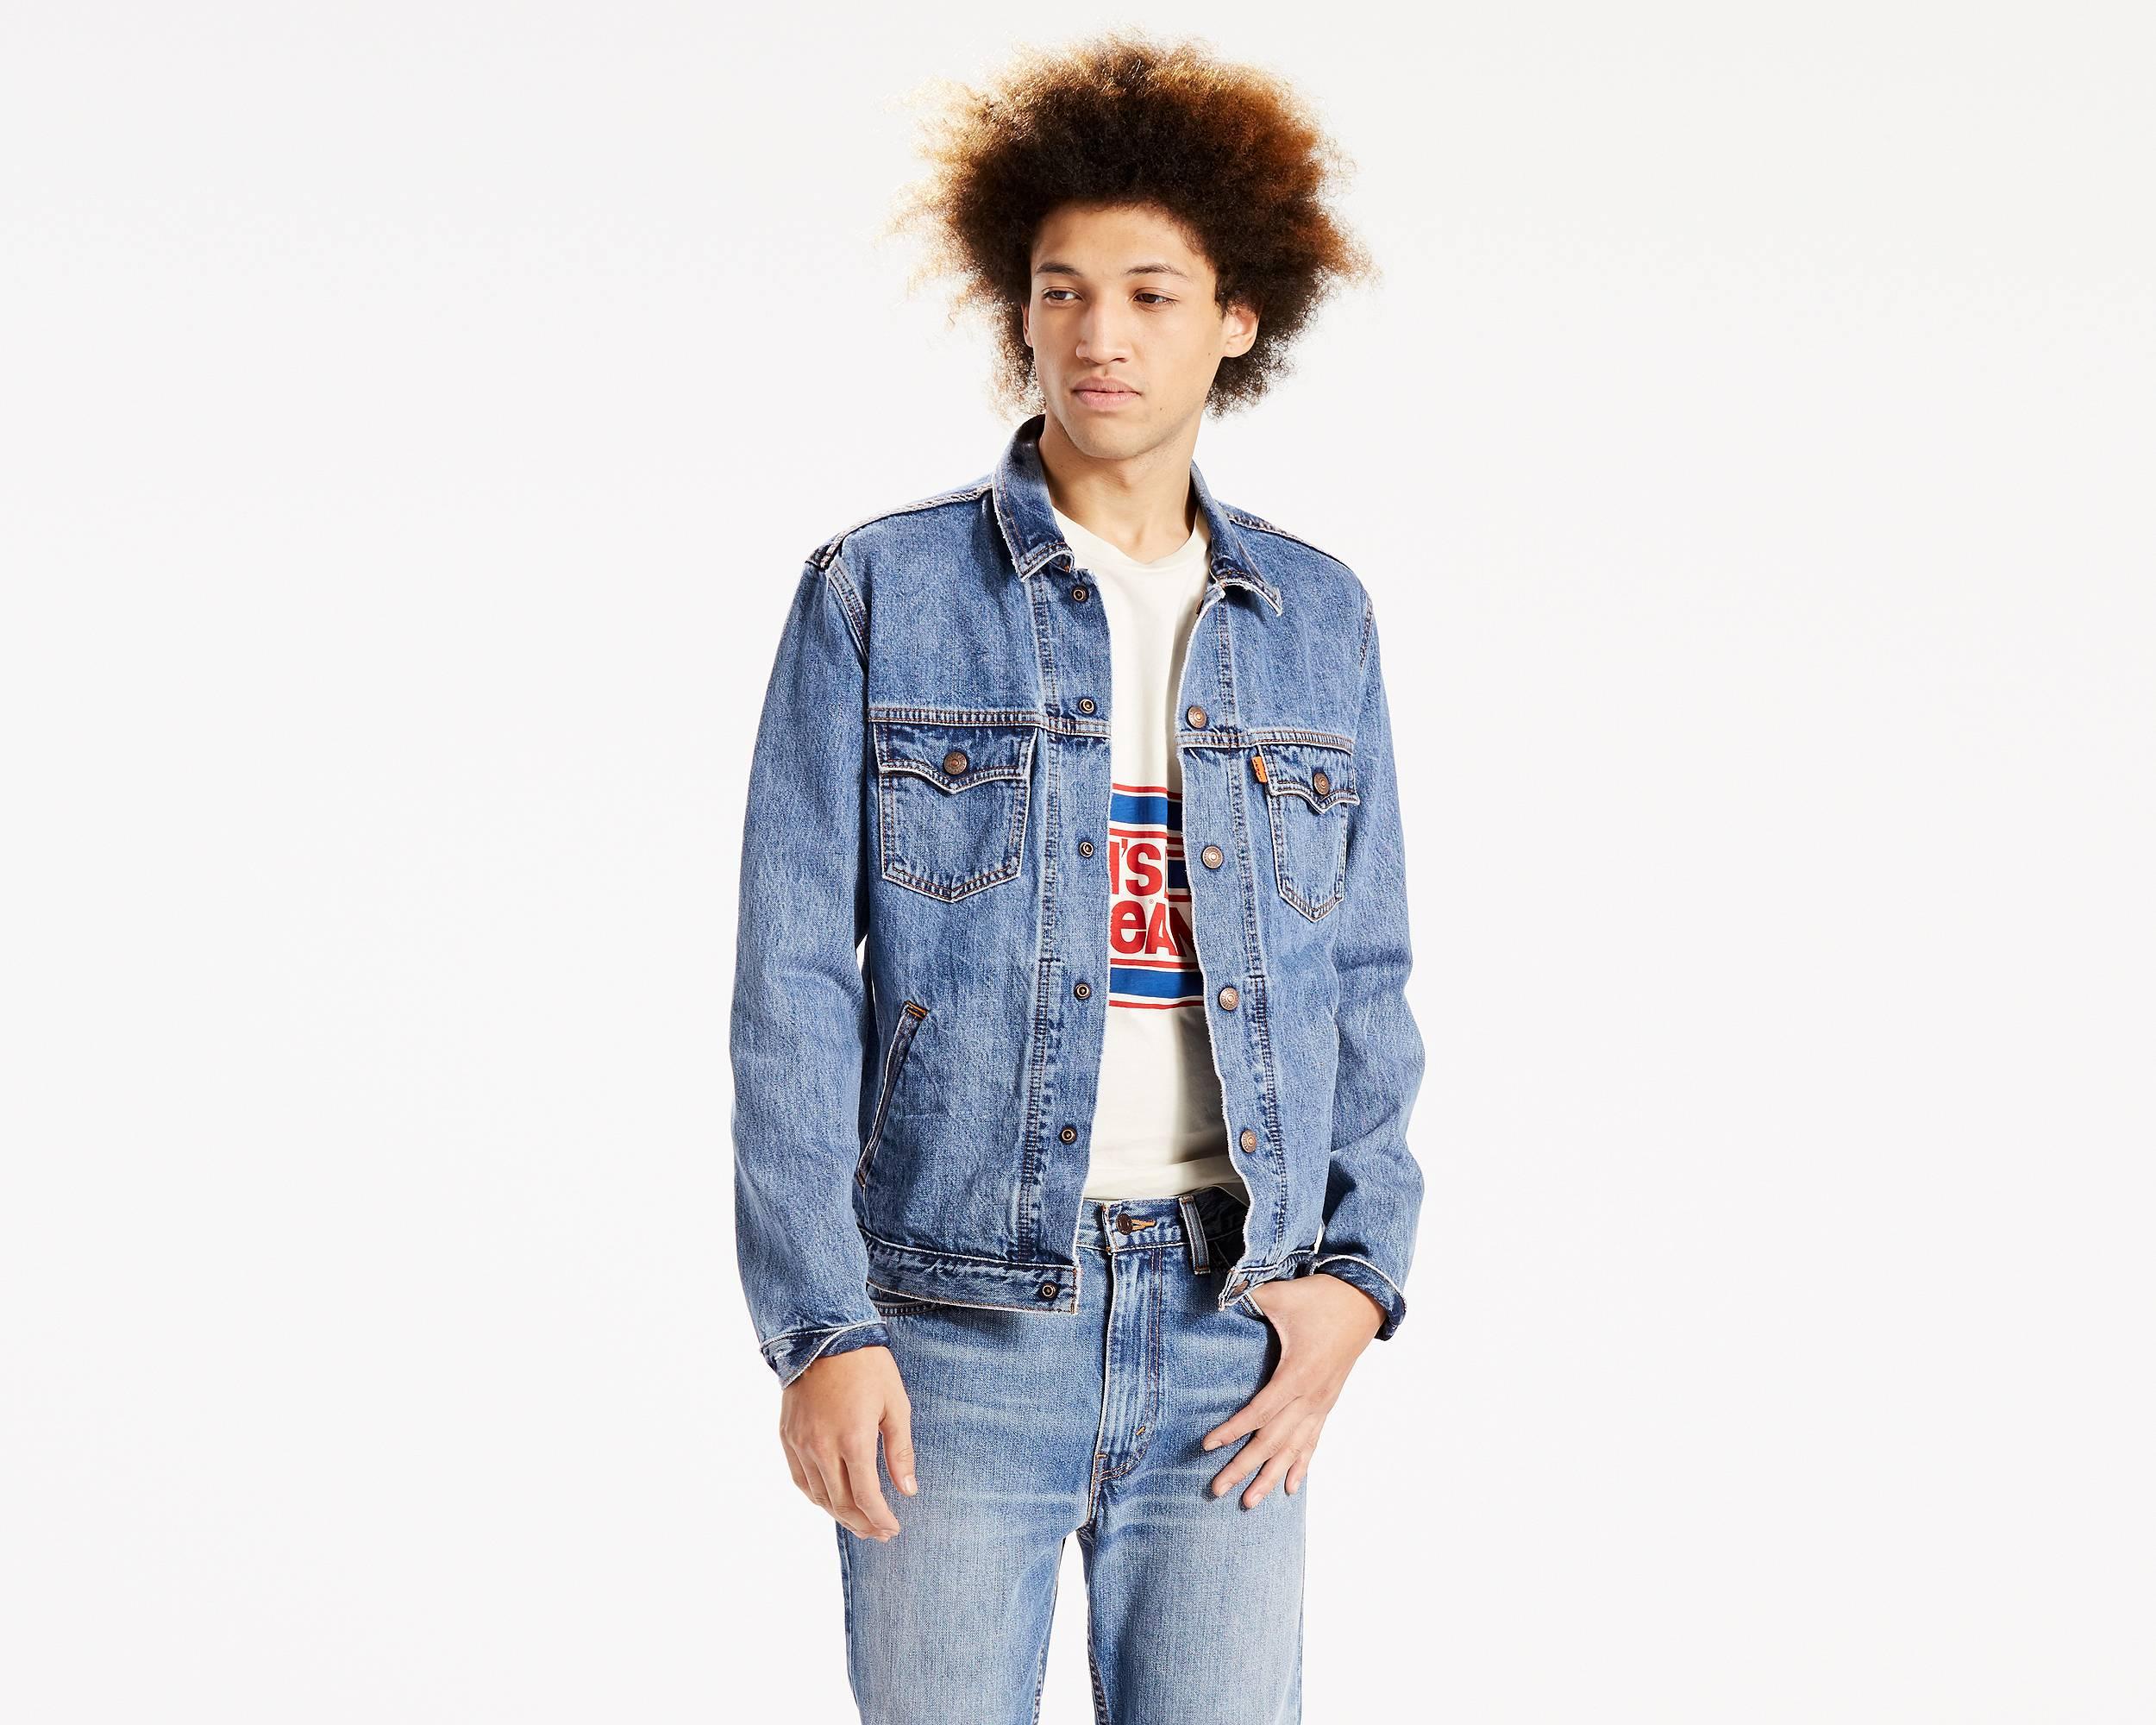 Trucker Jacket - Shop the Original Men's Denim Jacket | Levi's®